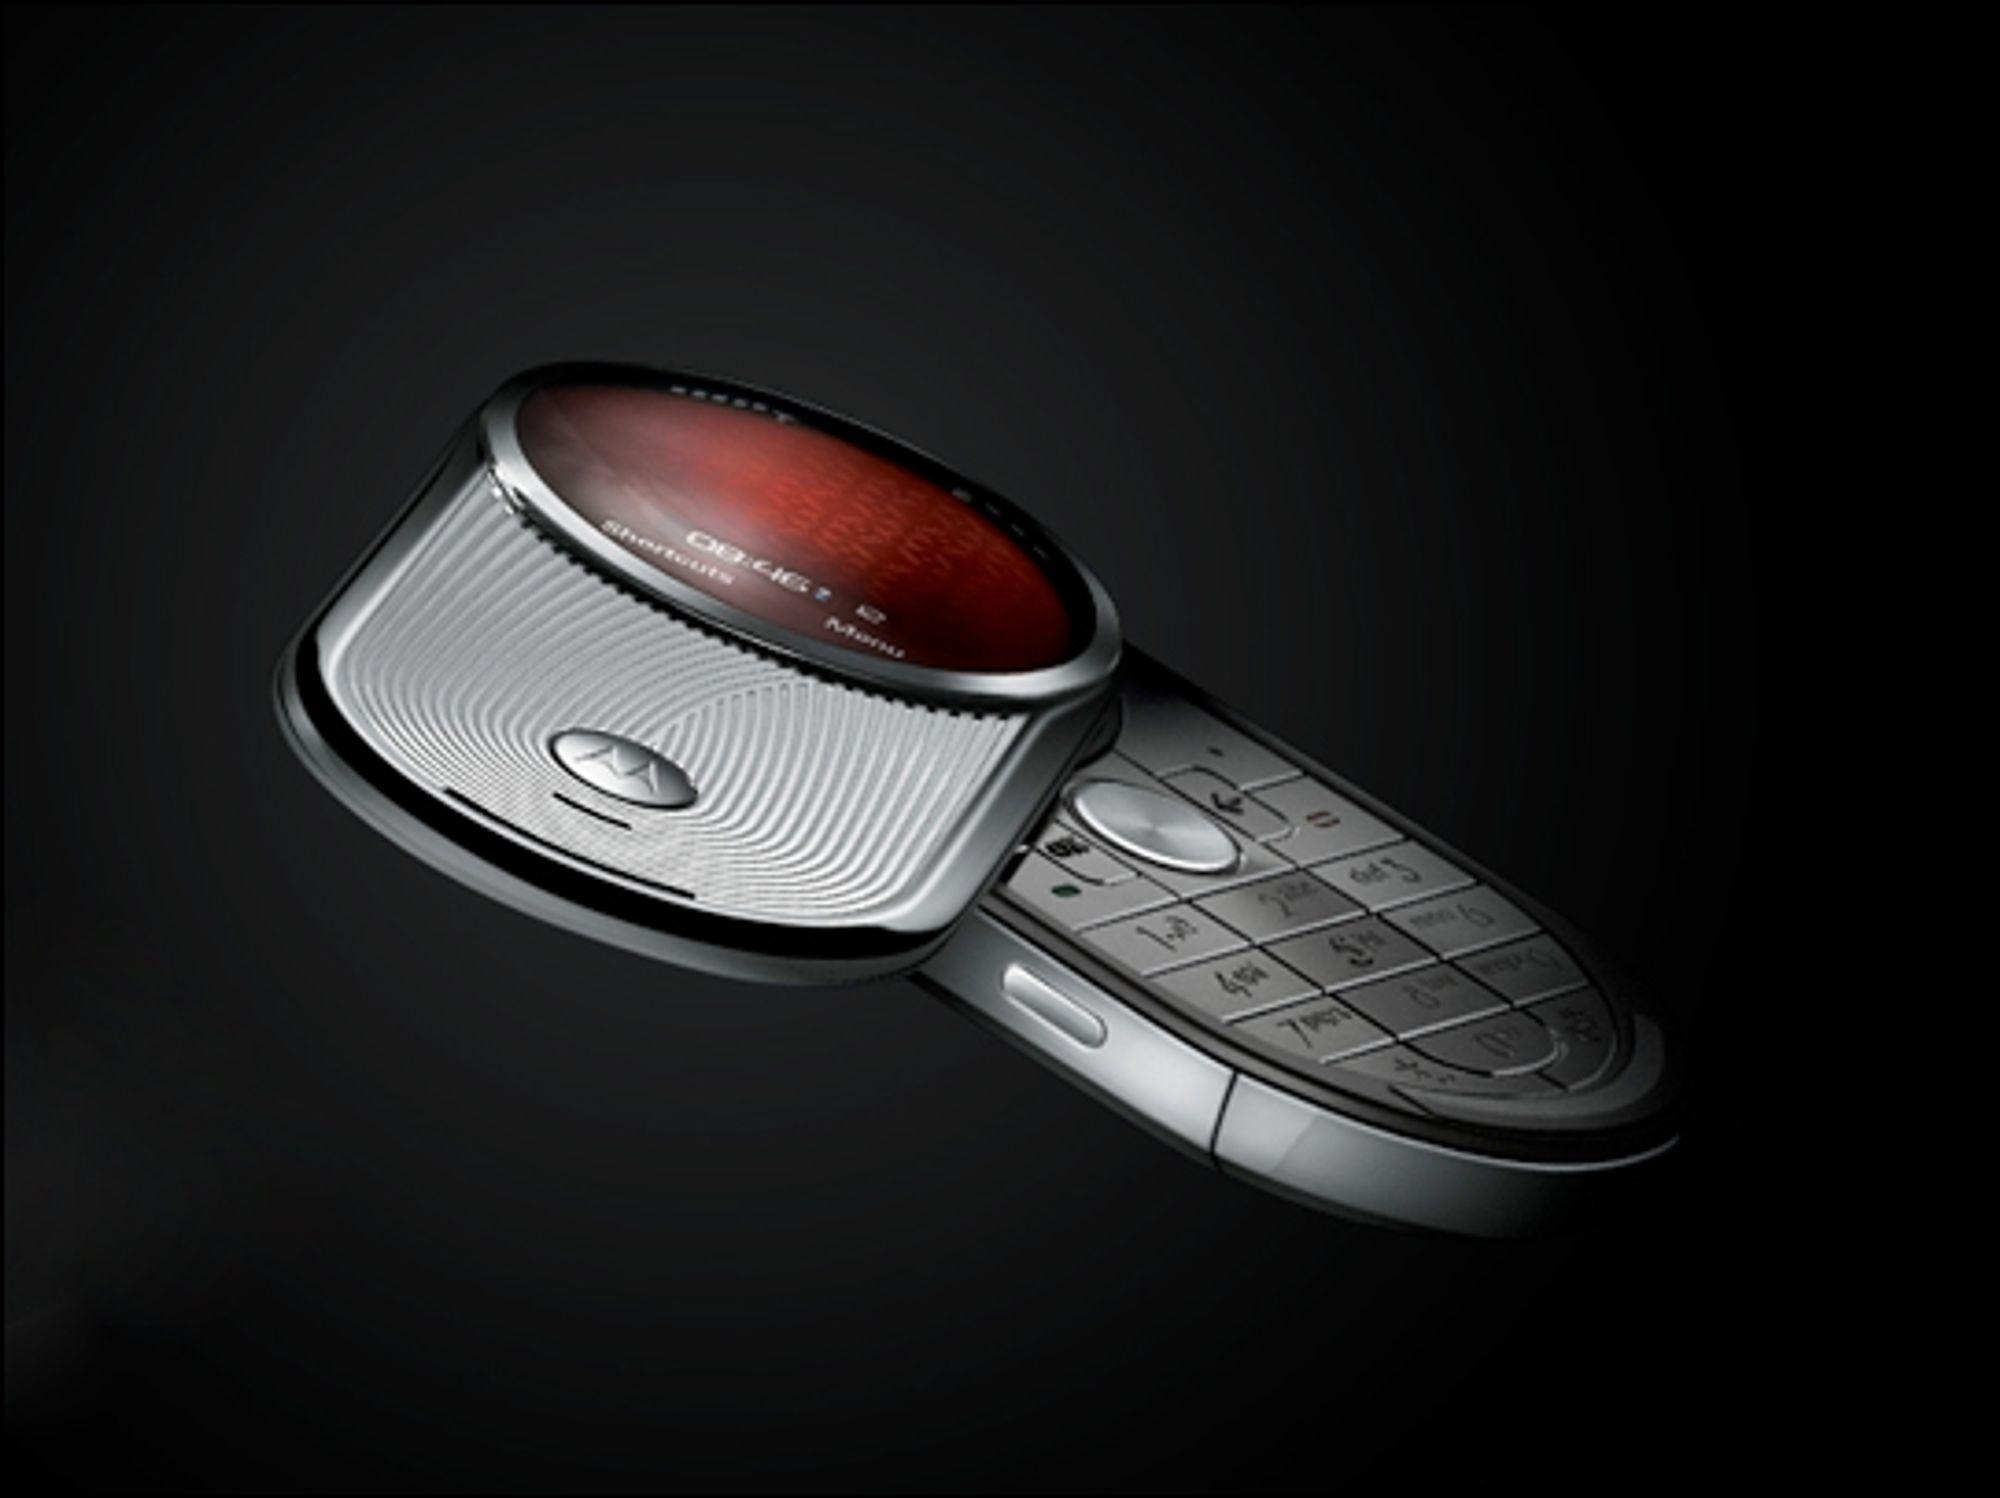 Motorola Aura er intet annet enn en perle. (Foto: Motorola)